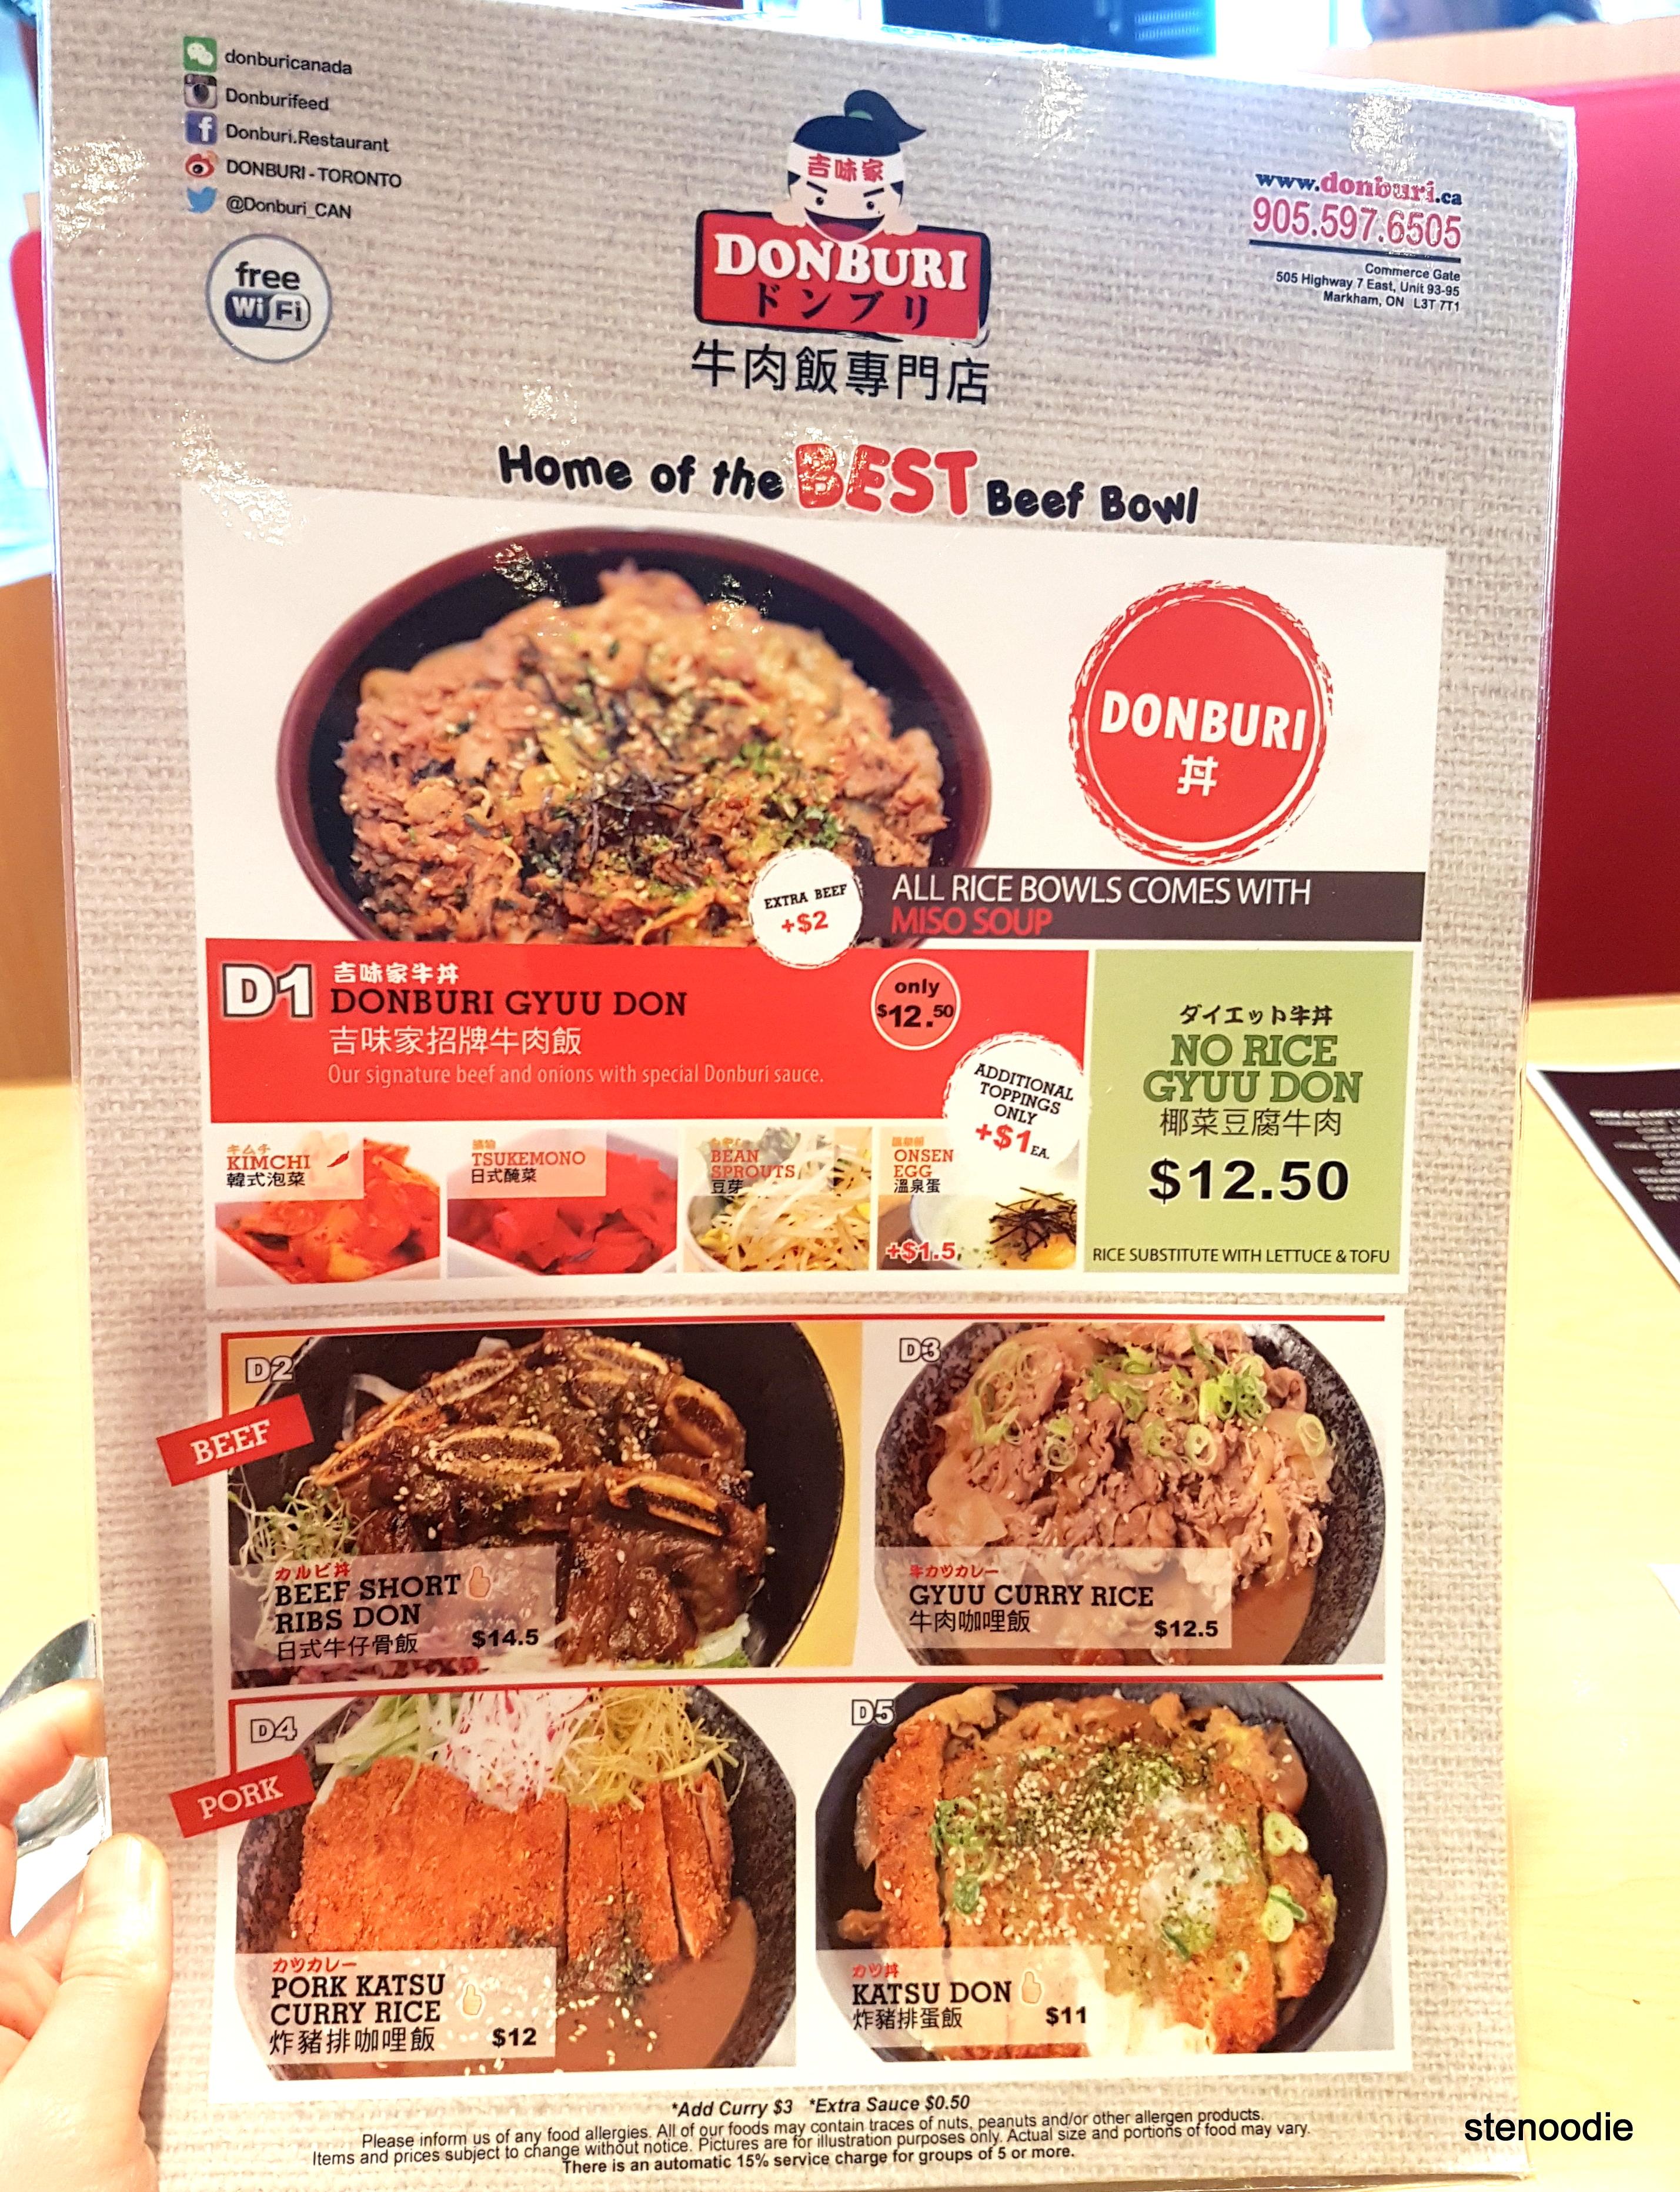 Donburi menu and prices